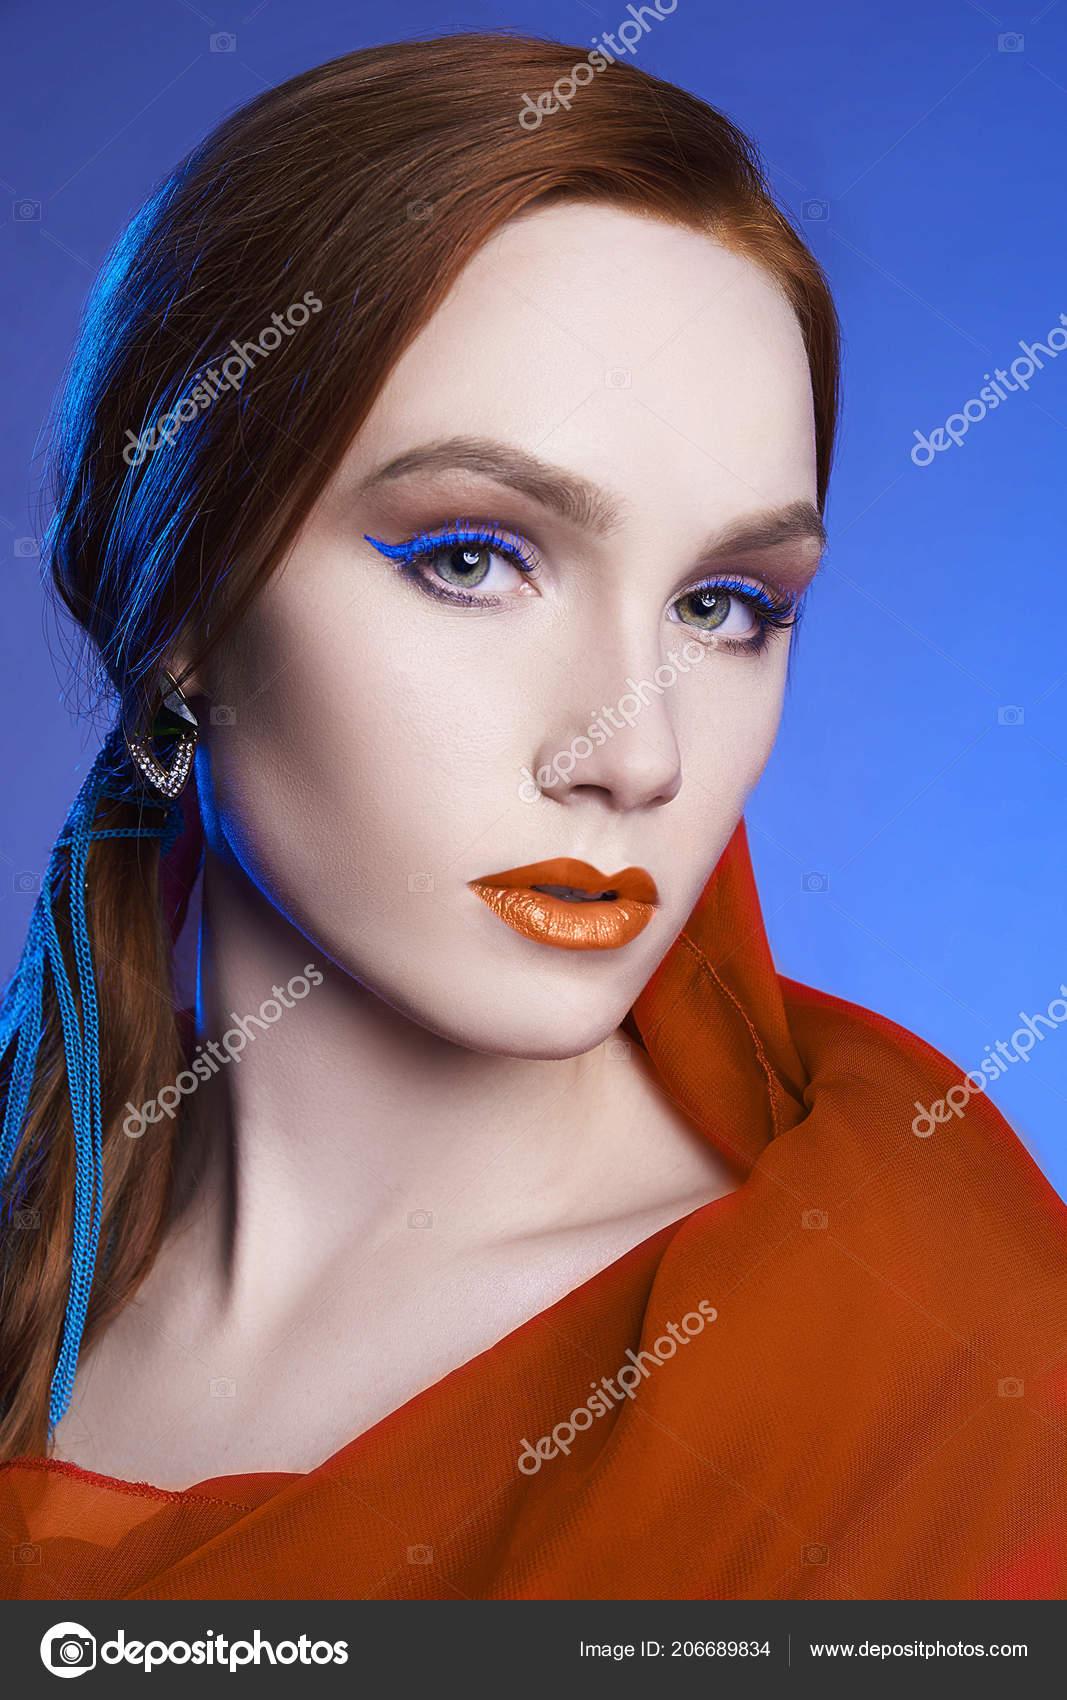 Cervene Modre Barvy Make Young Zena Portrait Beautiful Zazvor Divka